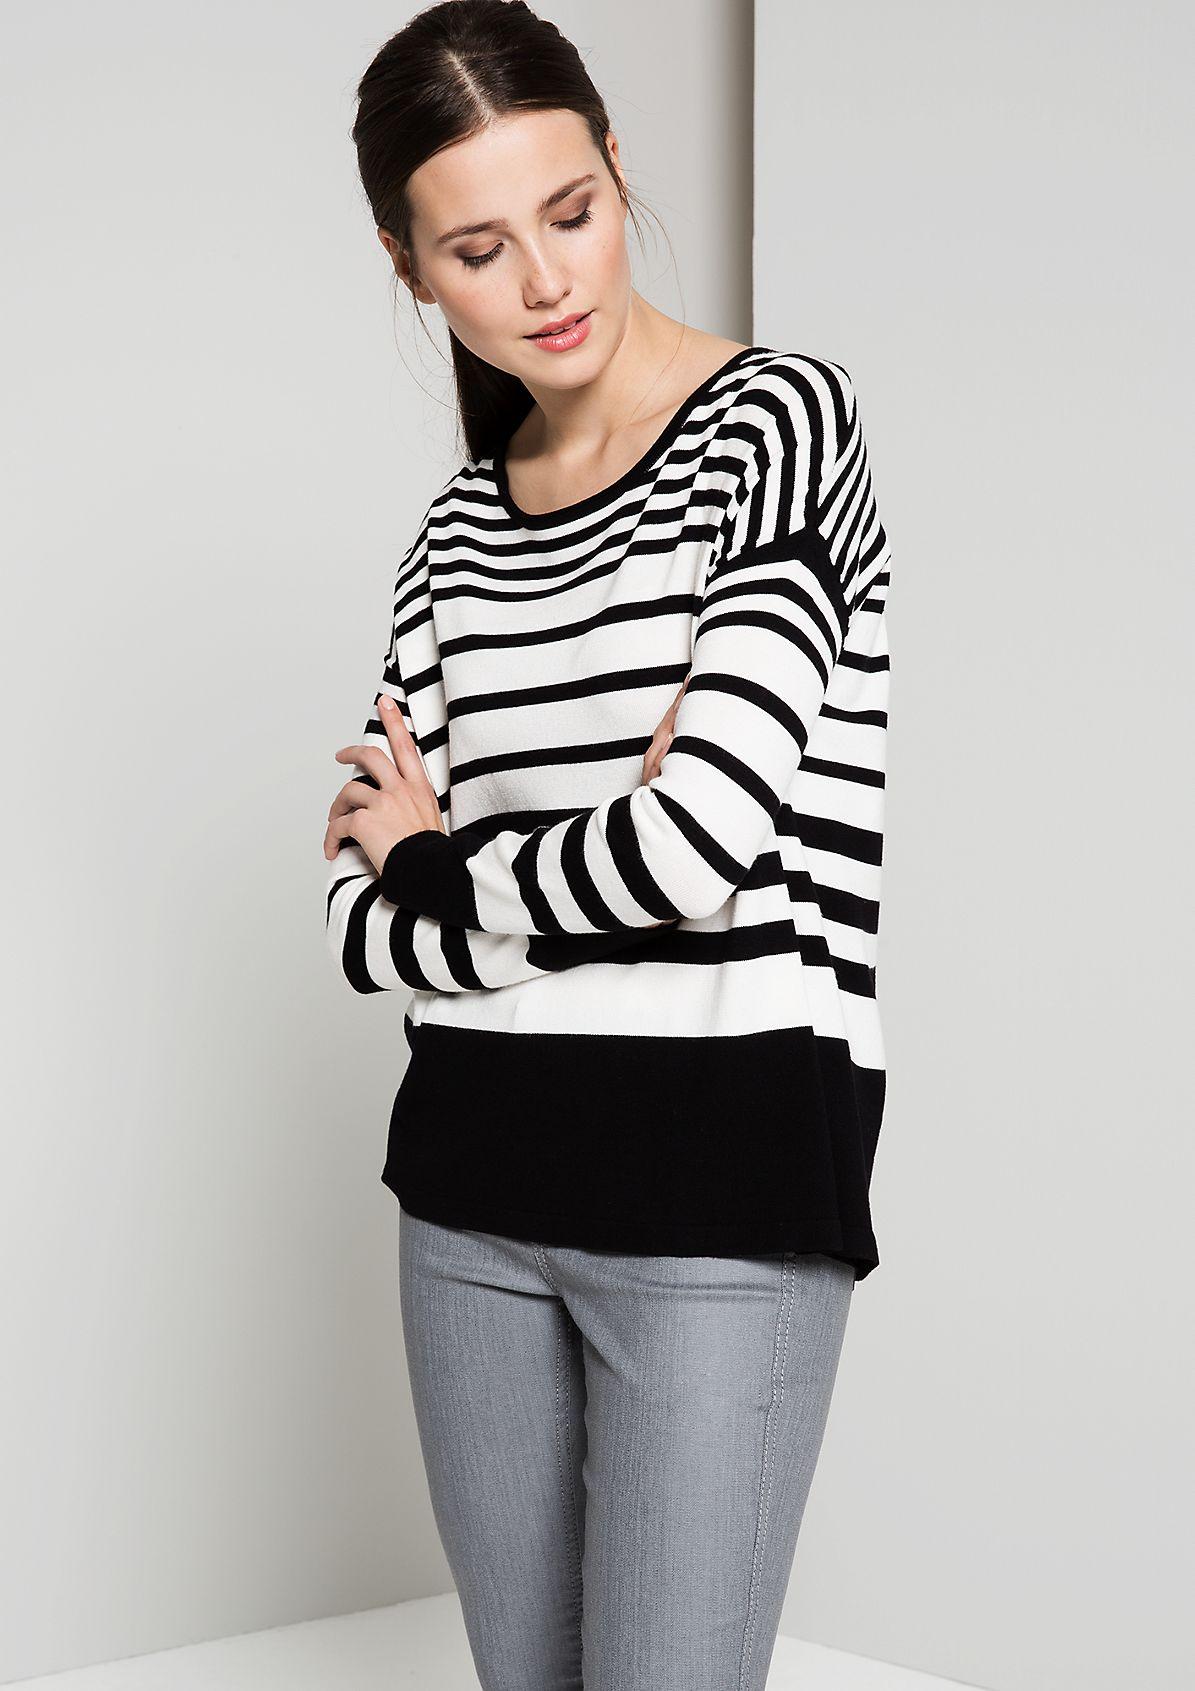 Smart knit jumper with fantastic details from s.Oliver